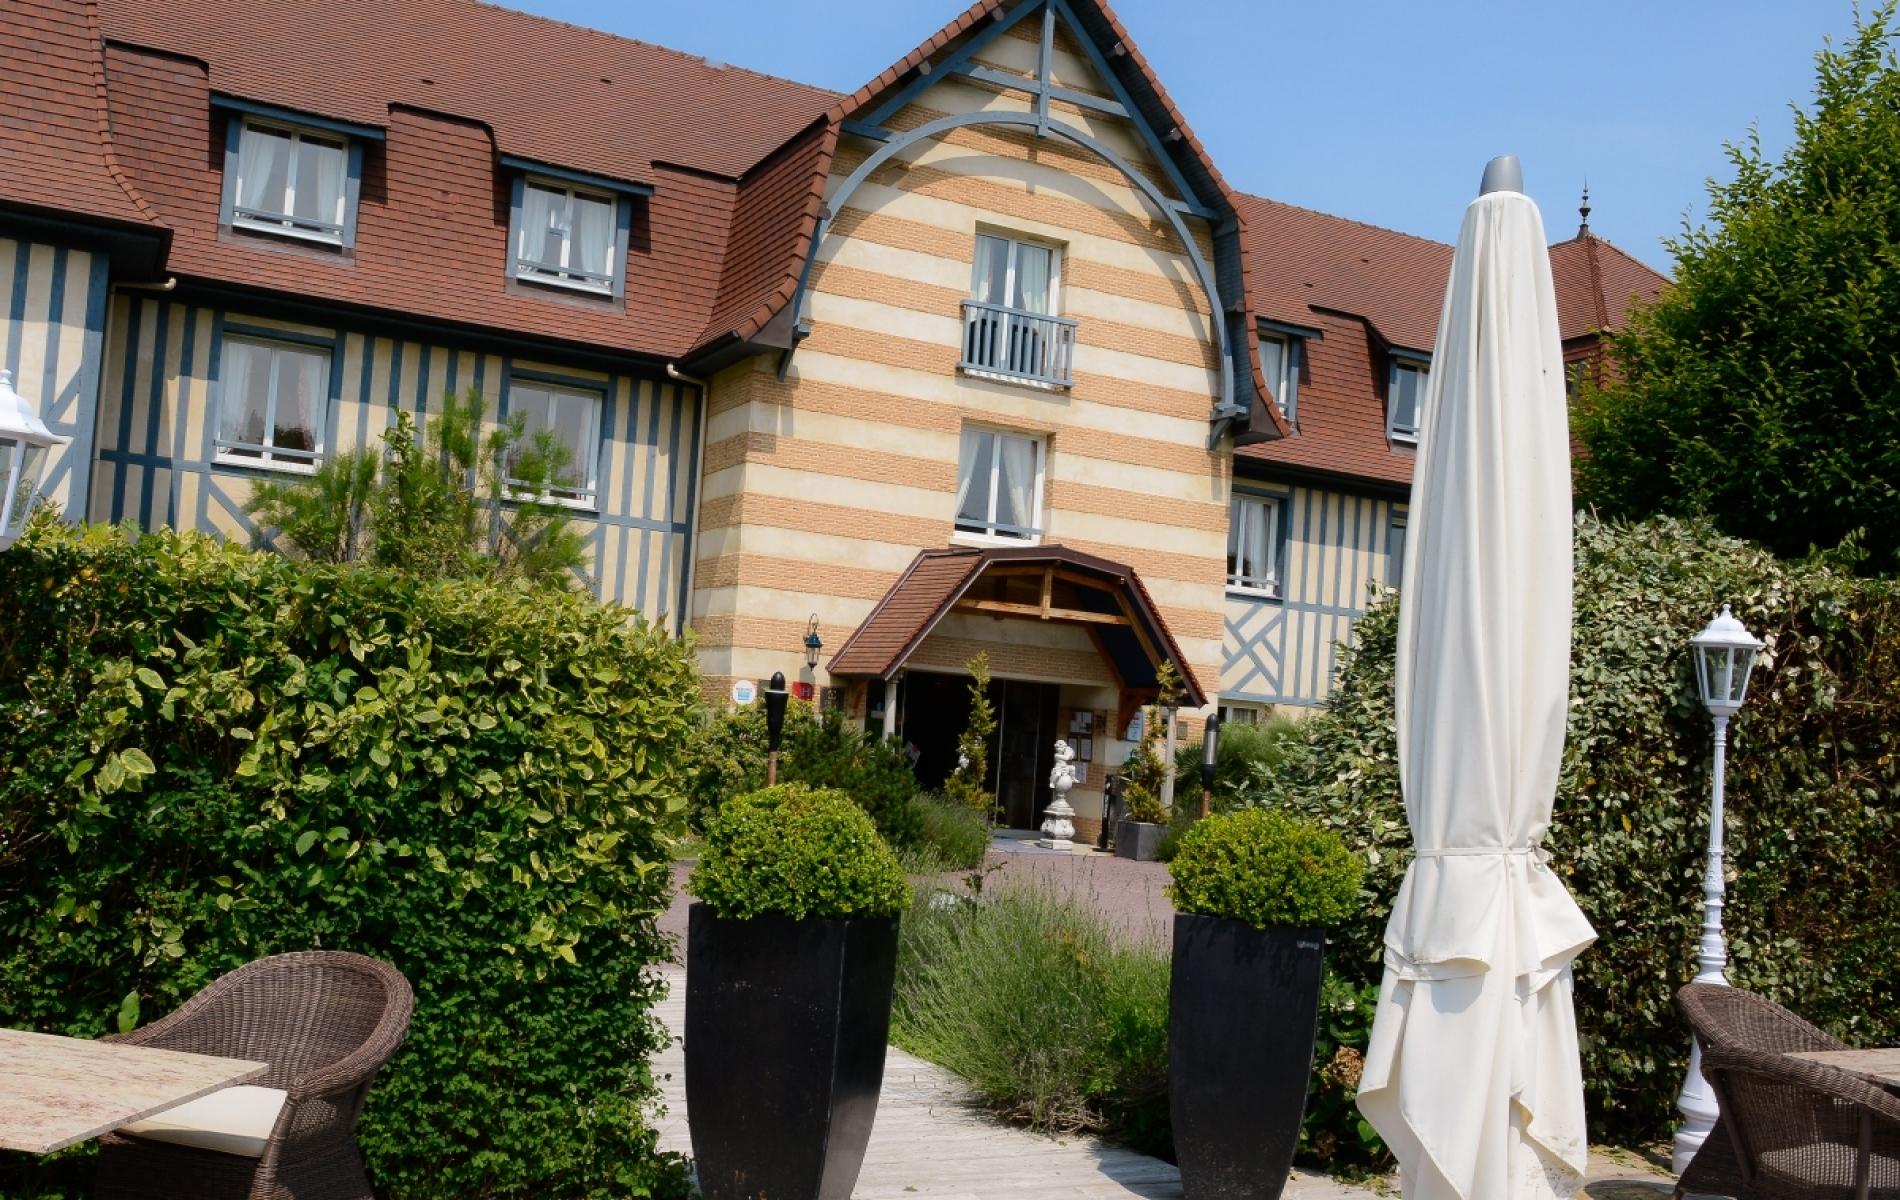 Seminaire Normandie - Hotel